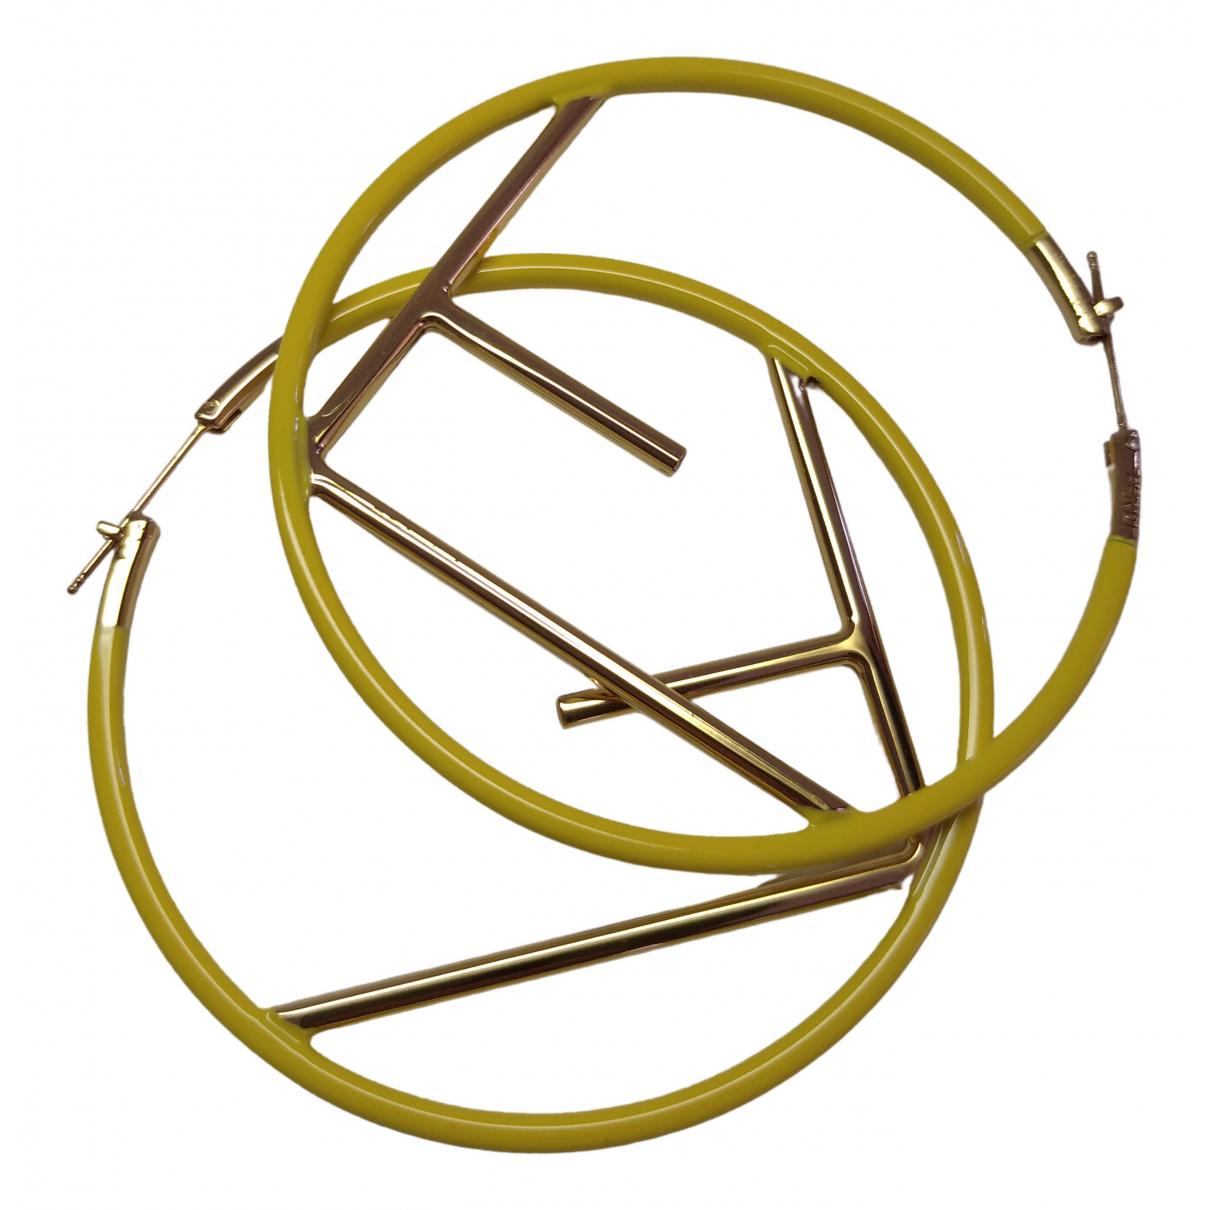 Fendi The Fendista OhrRing in  Gelb Metall